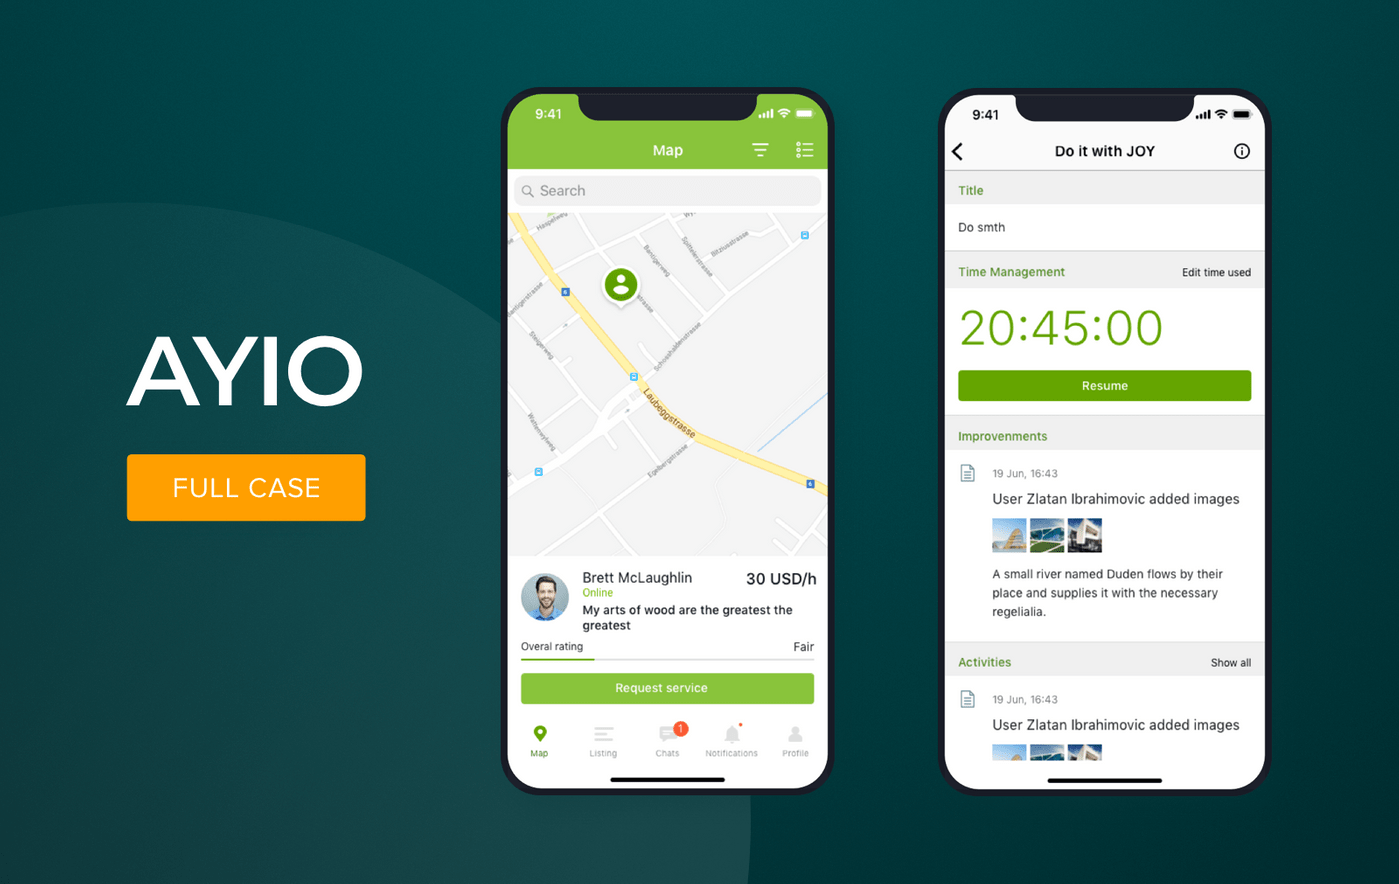 AYIO social business platform